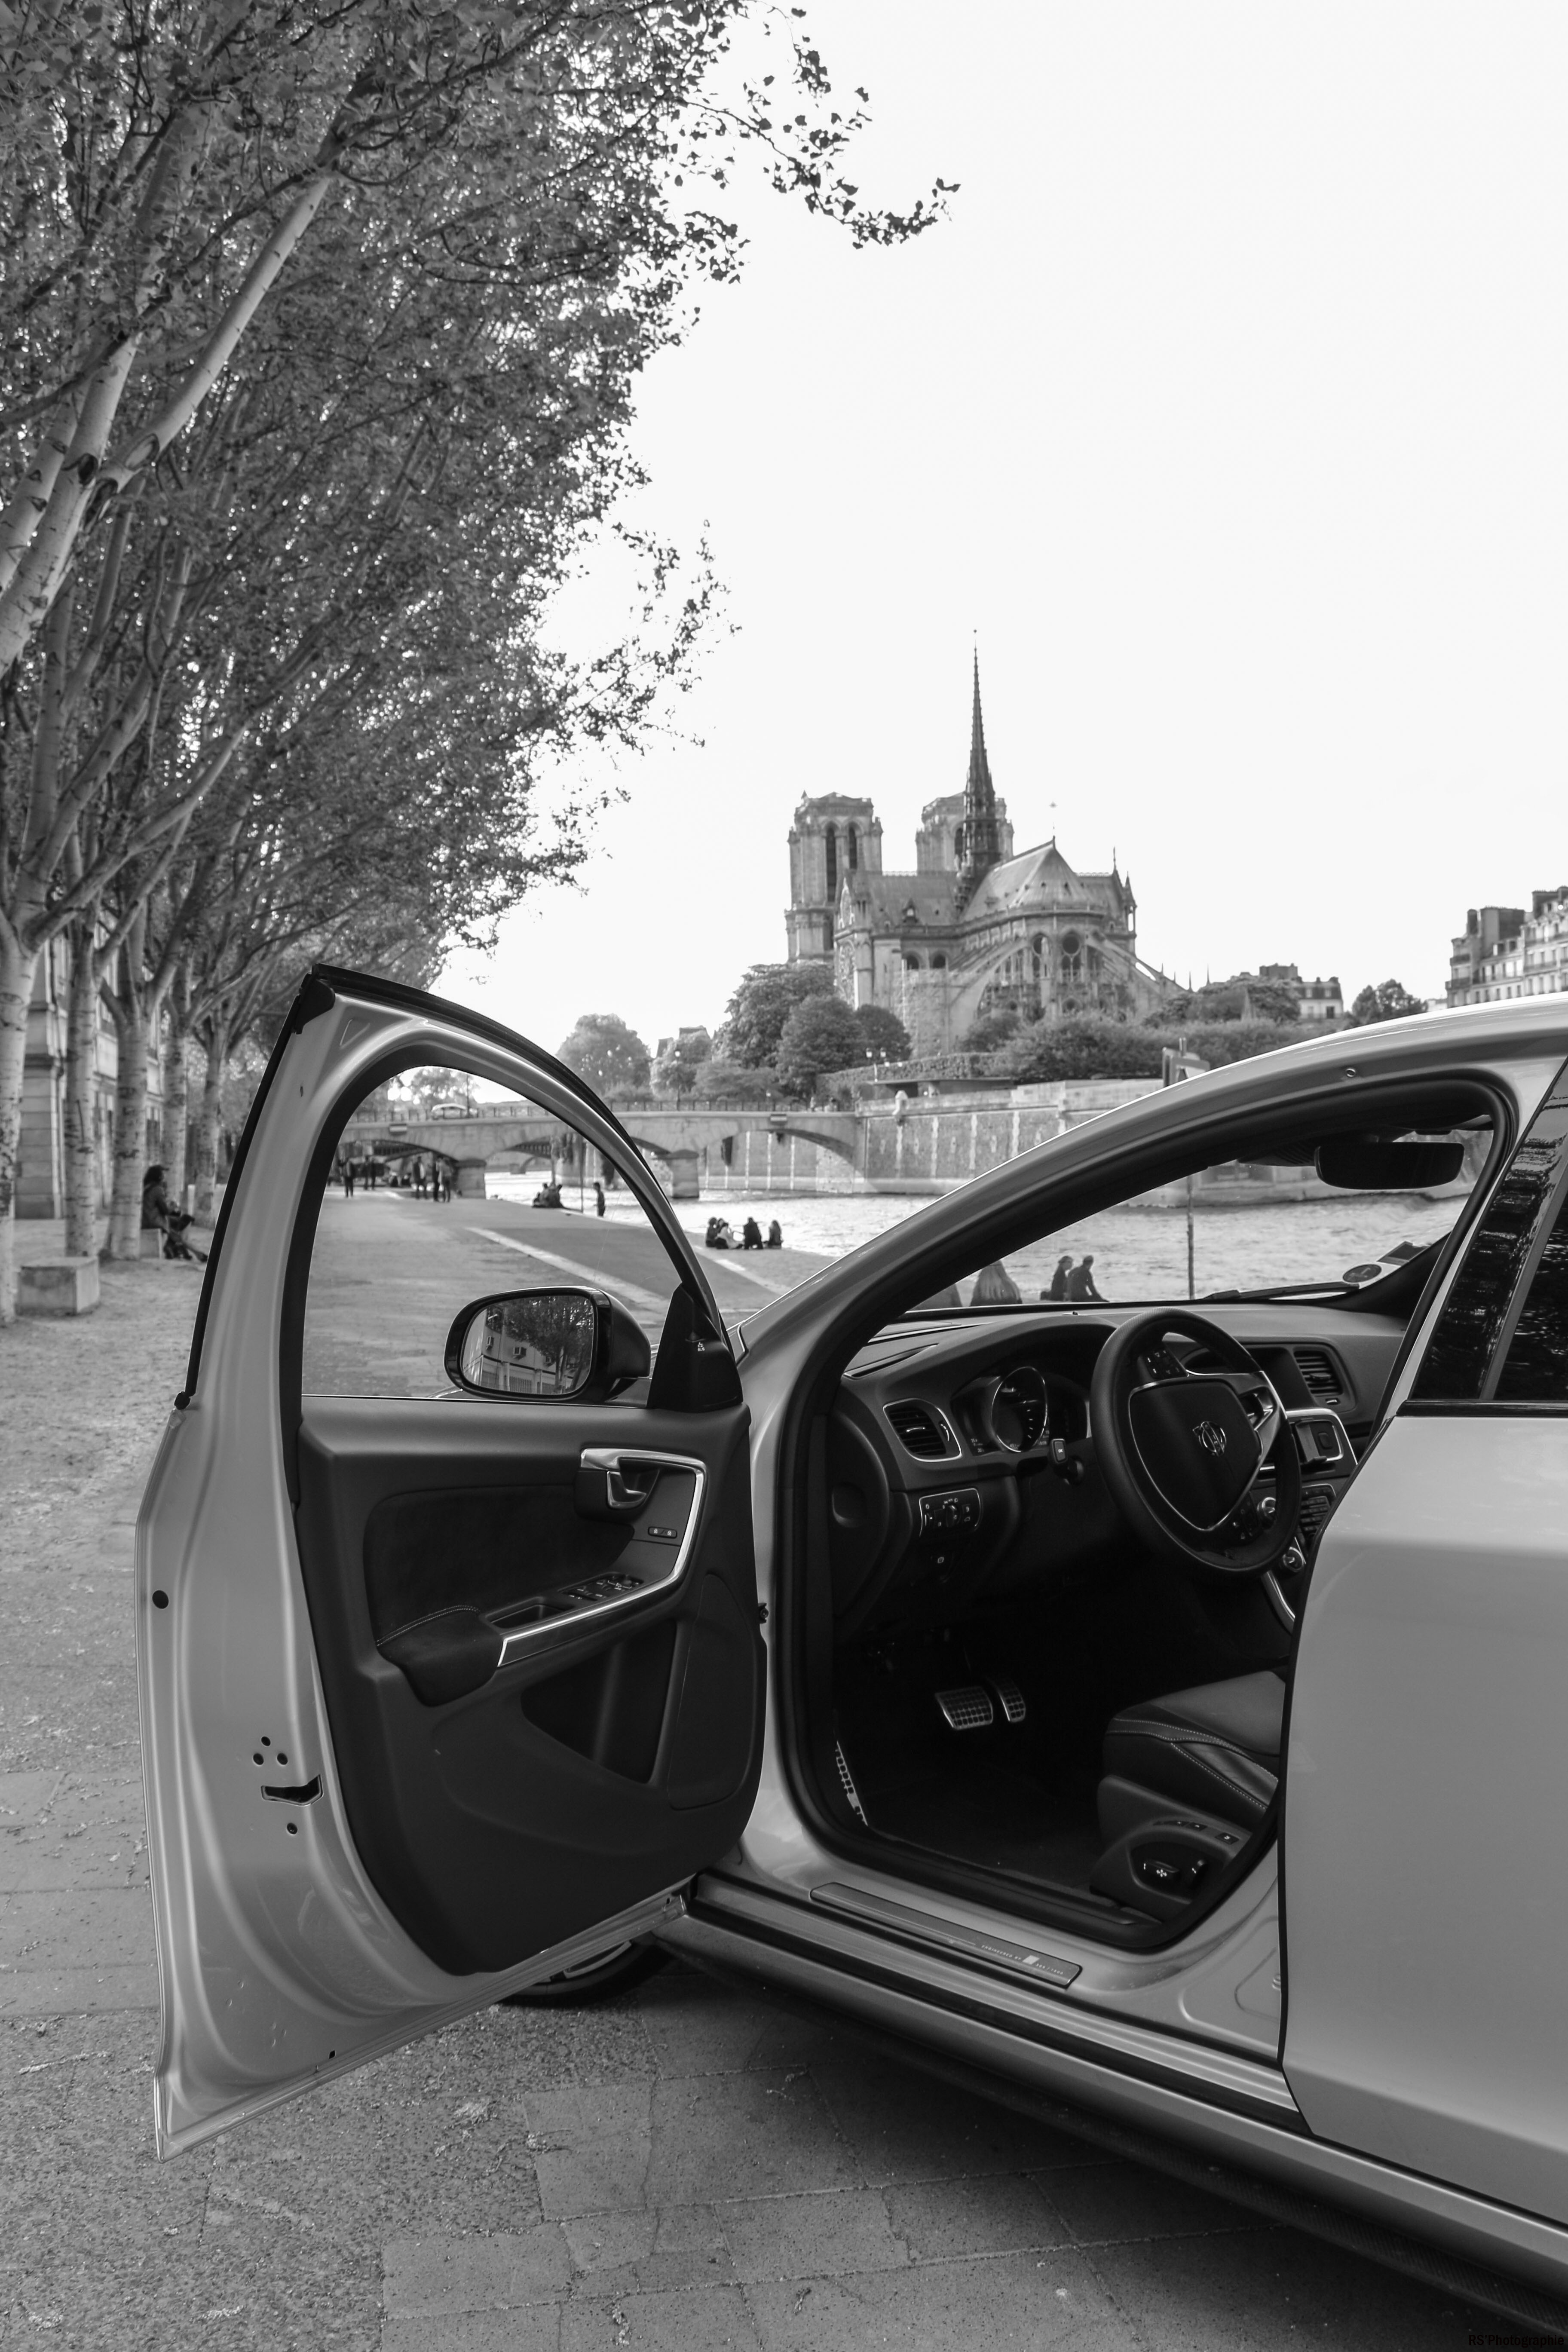 volvov60polestar61-volvo-v60-polestar-intérieur-onboard-Arnaud Demasier-RSPhotographie